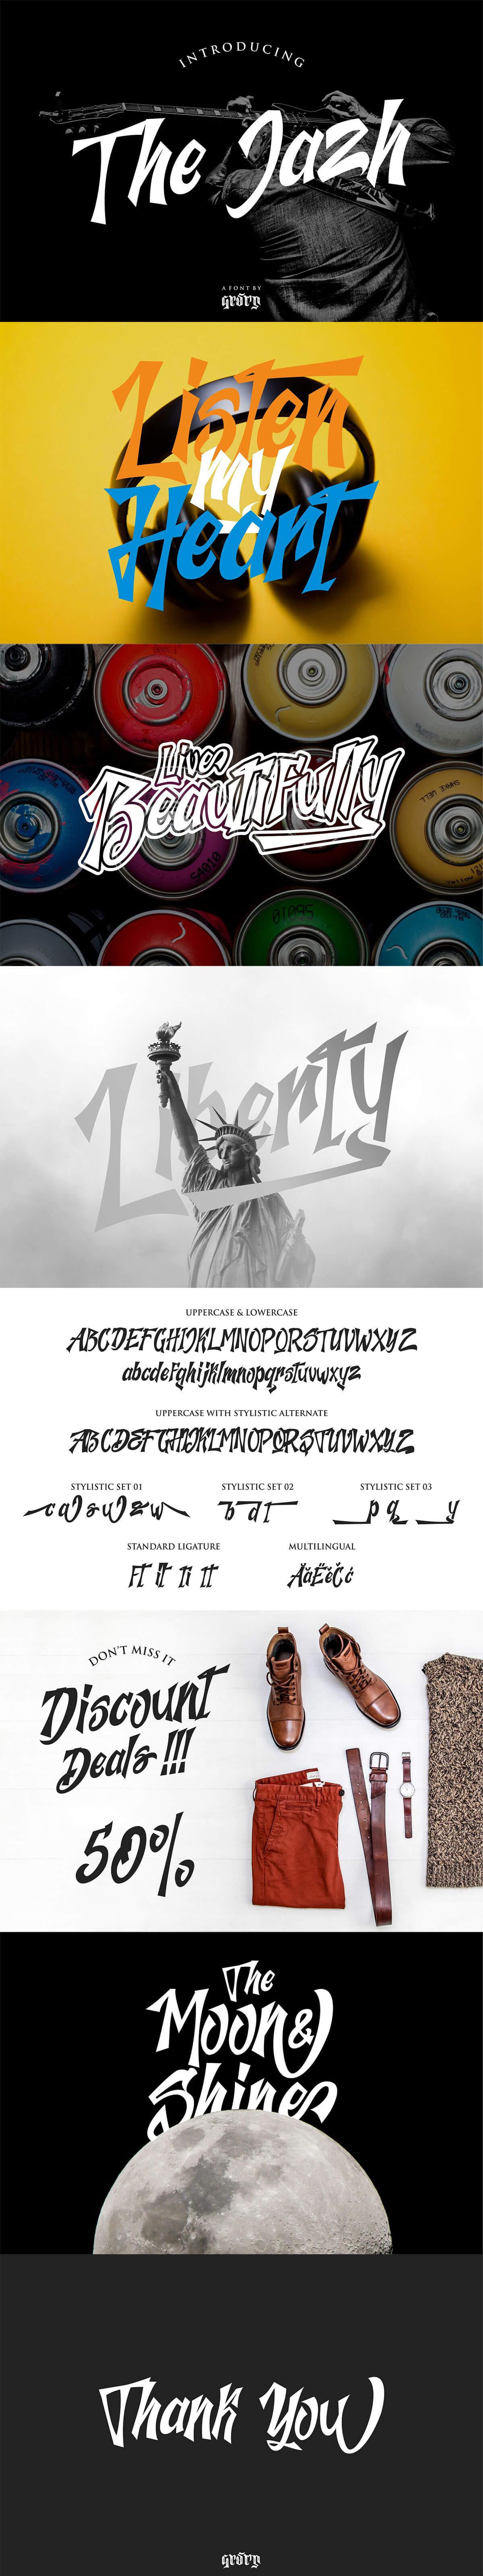 Free Jazh Handwritten Script Font